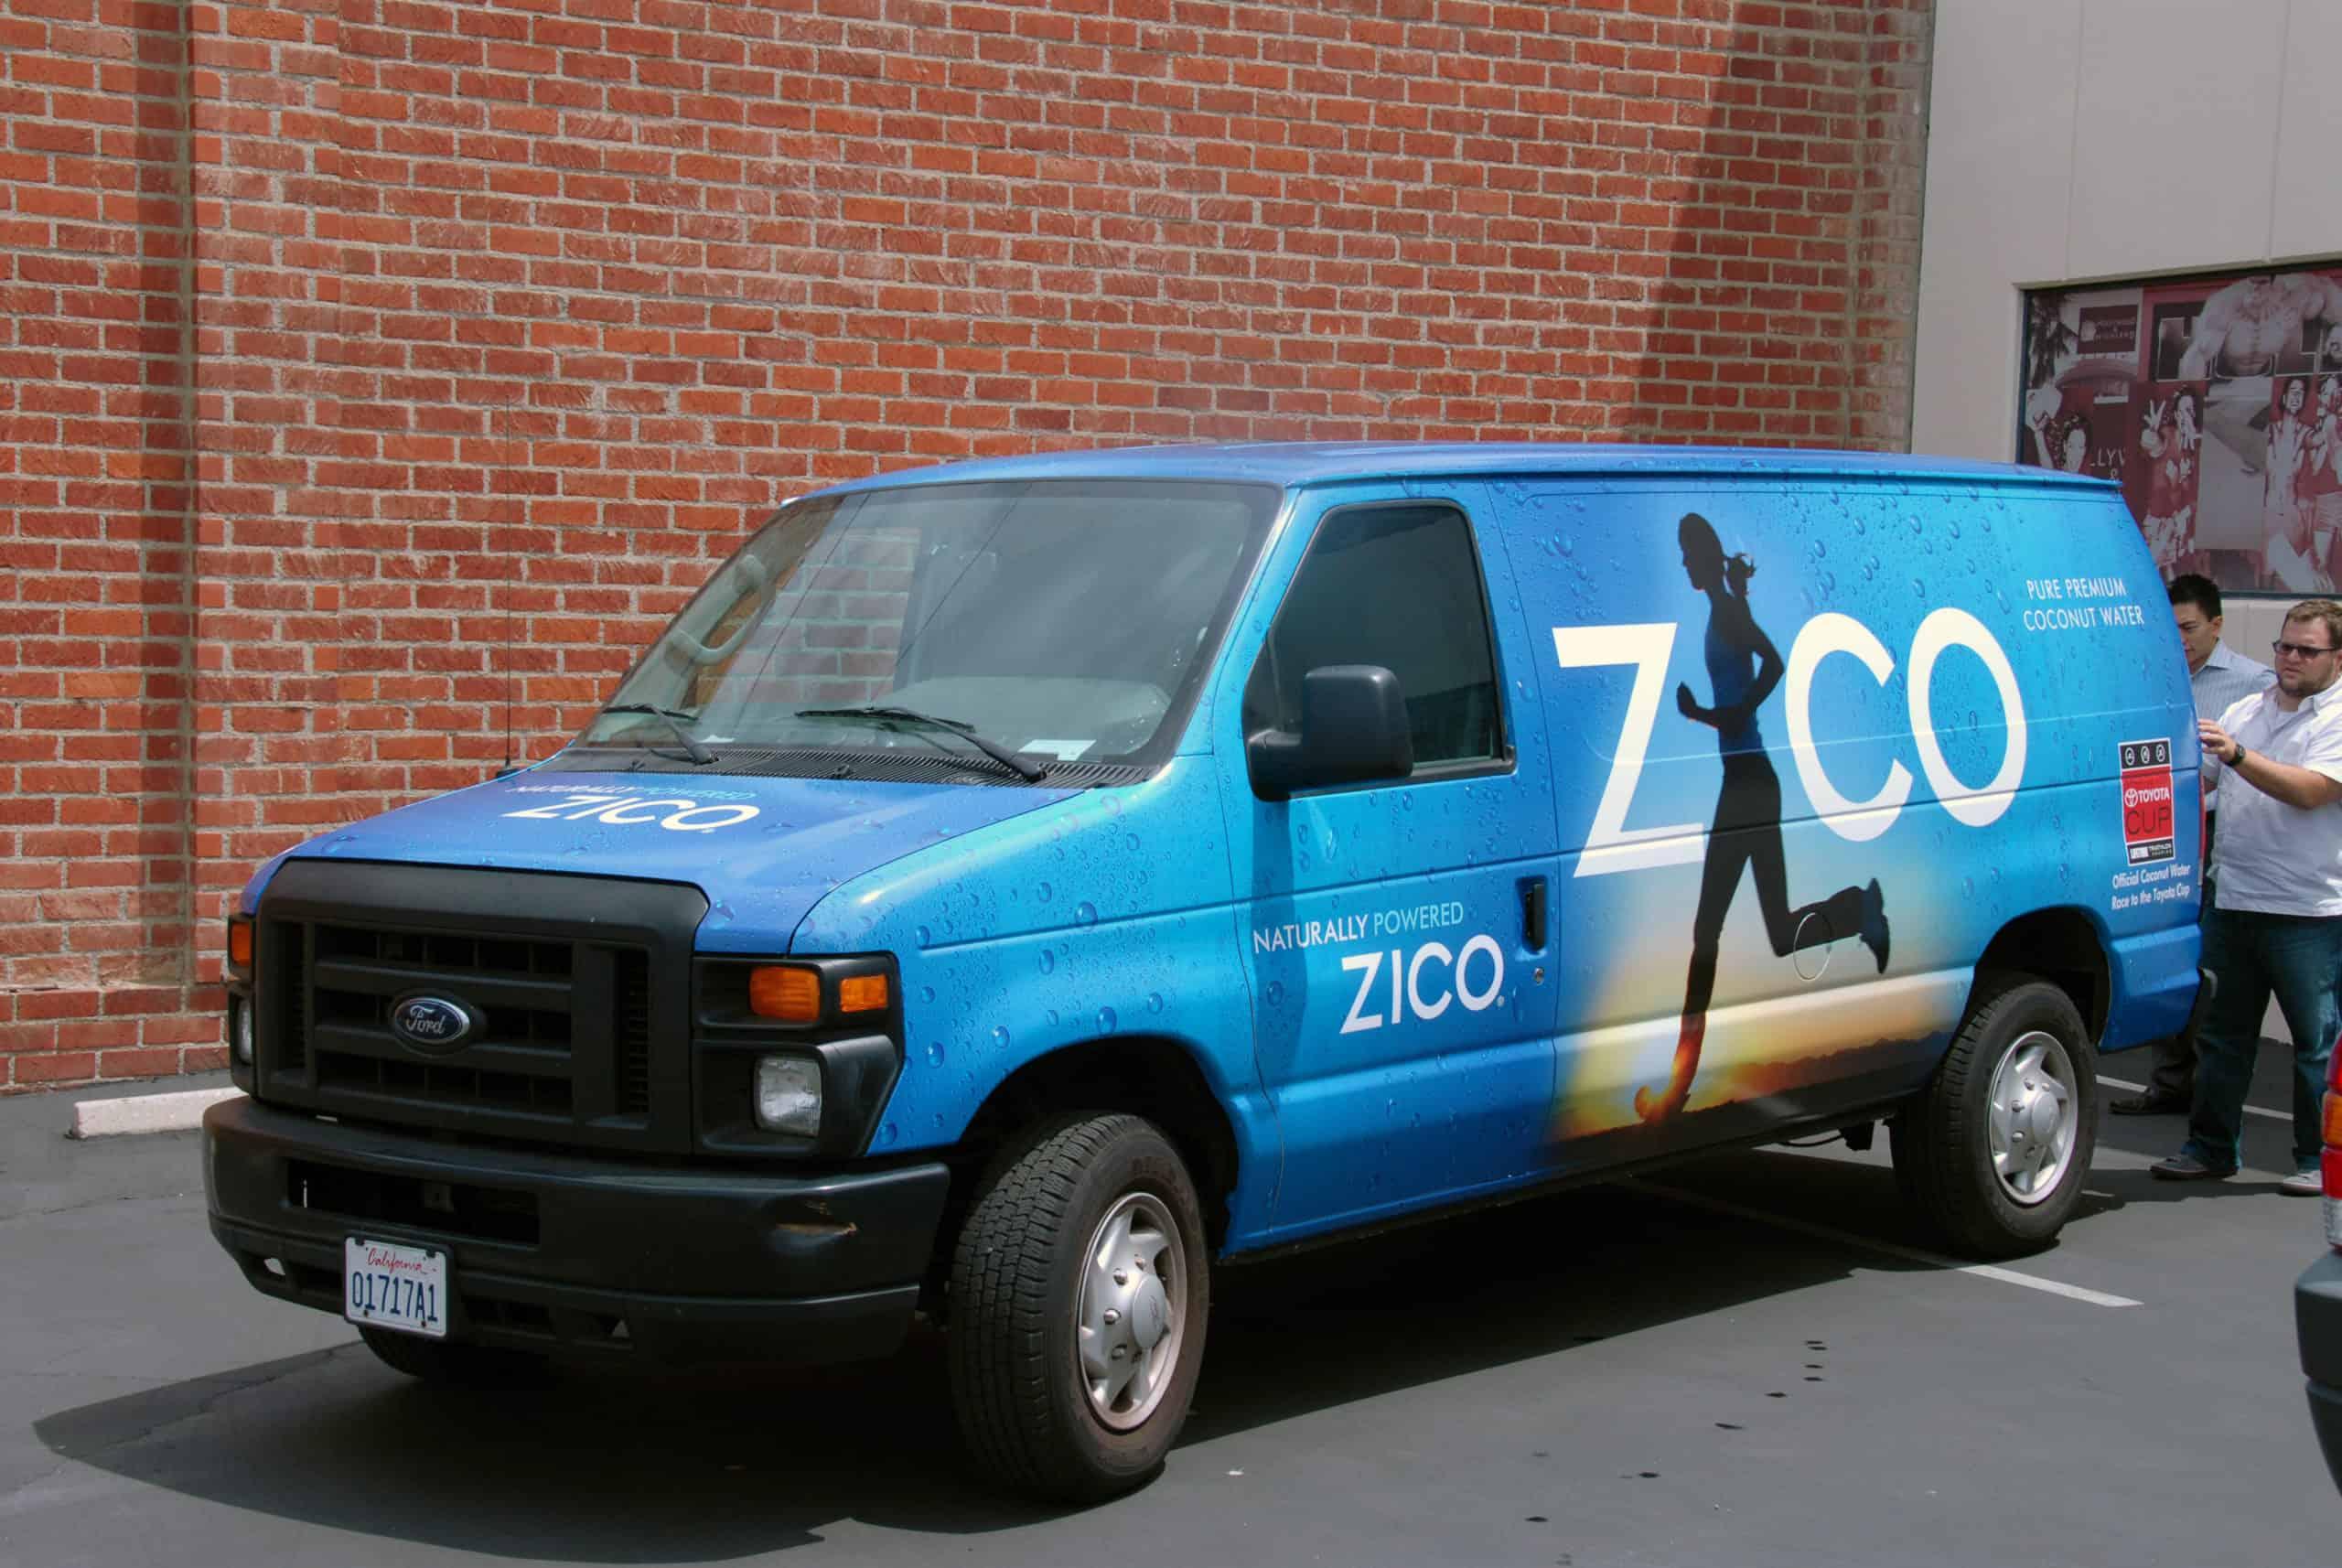 ZICO hired Platon Graphics to do their fleet graphics